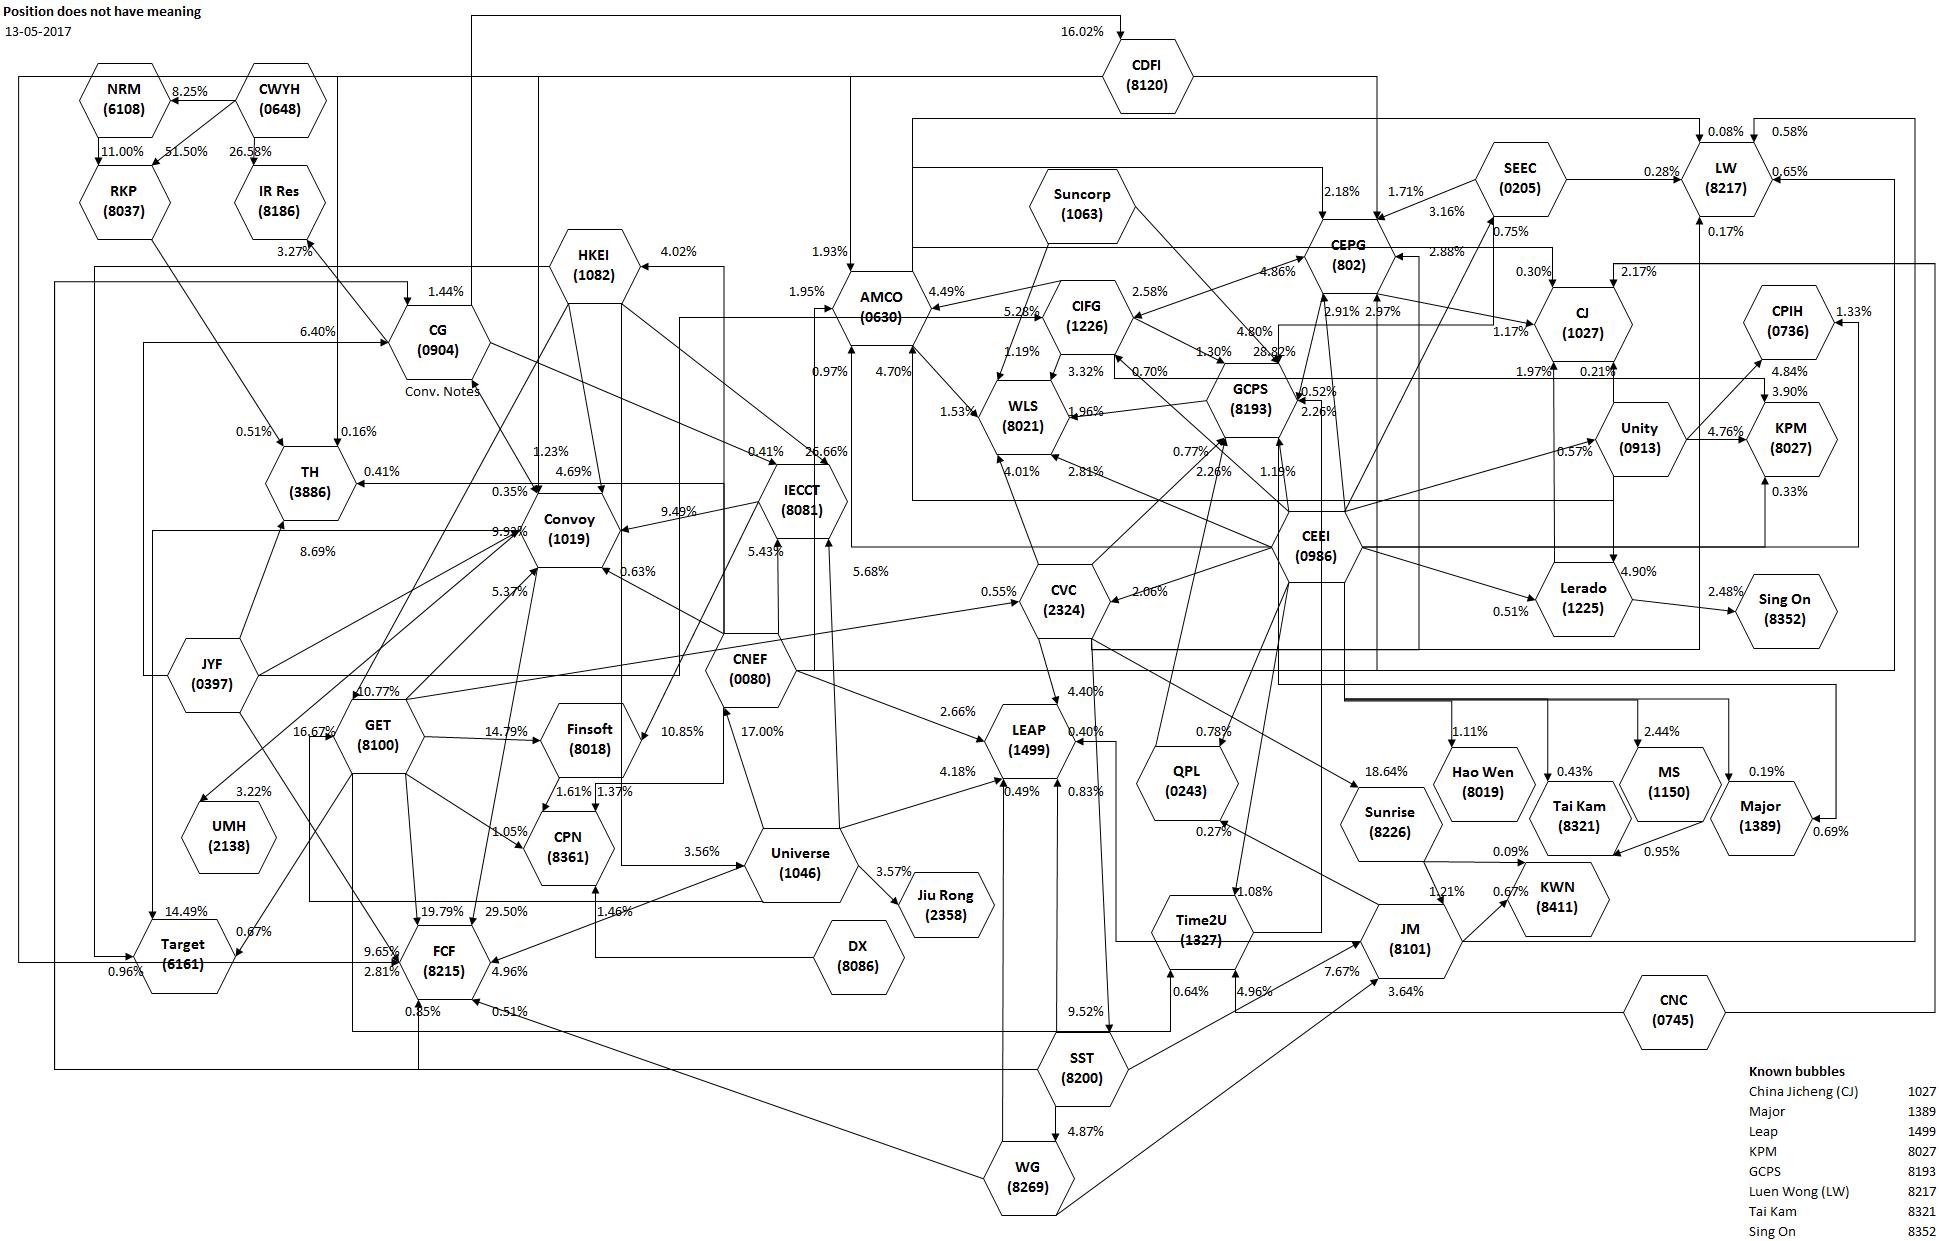 The Engima Network